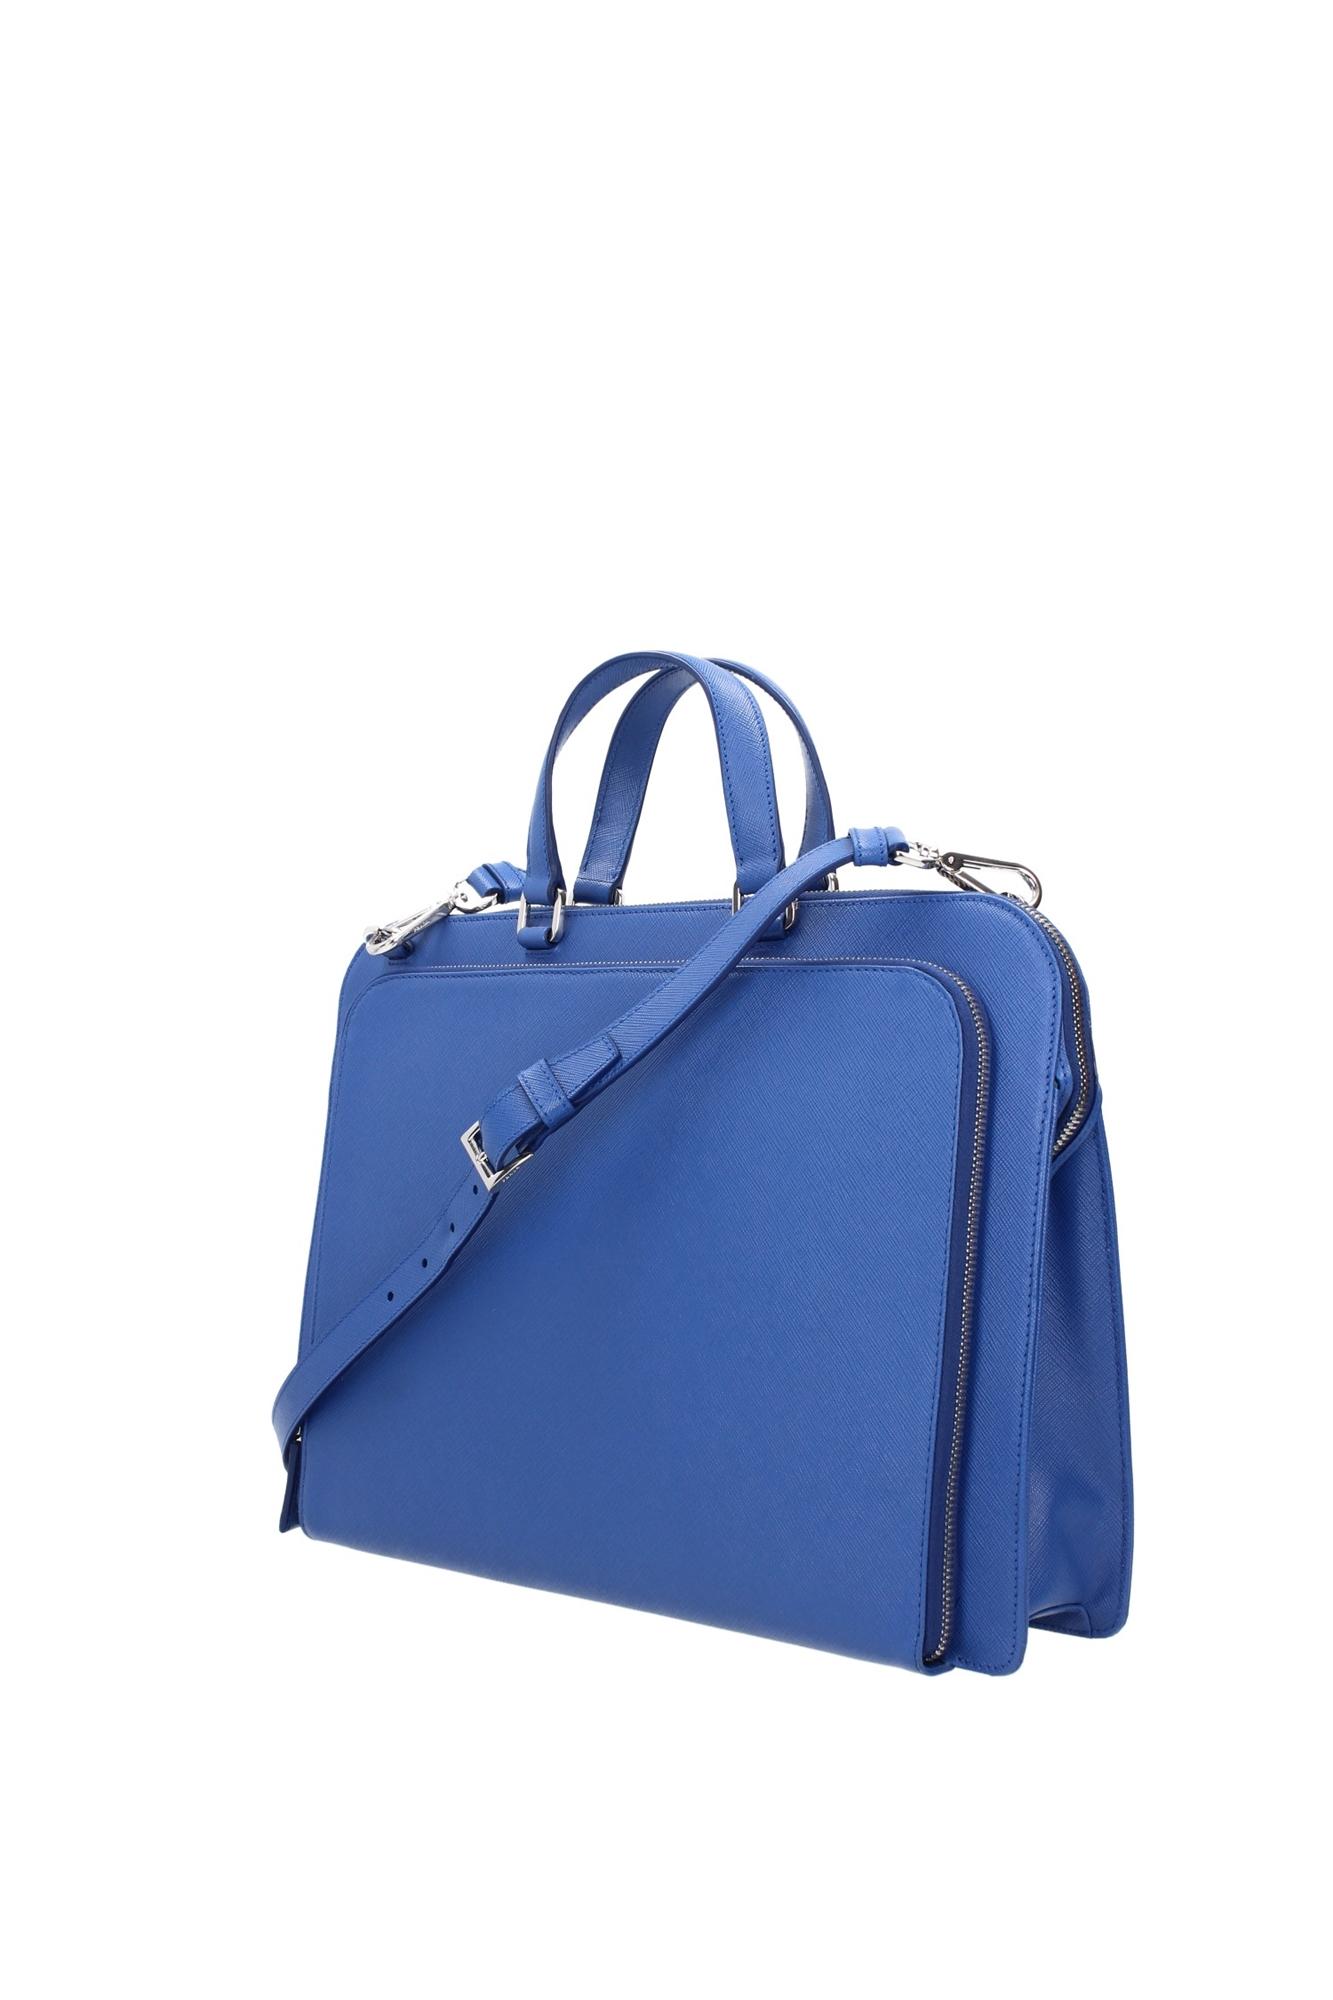 blue briefcase photo - 1